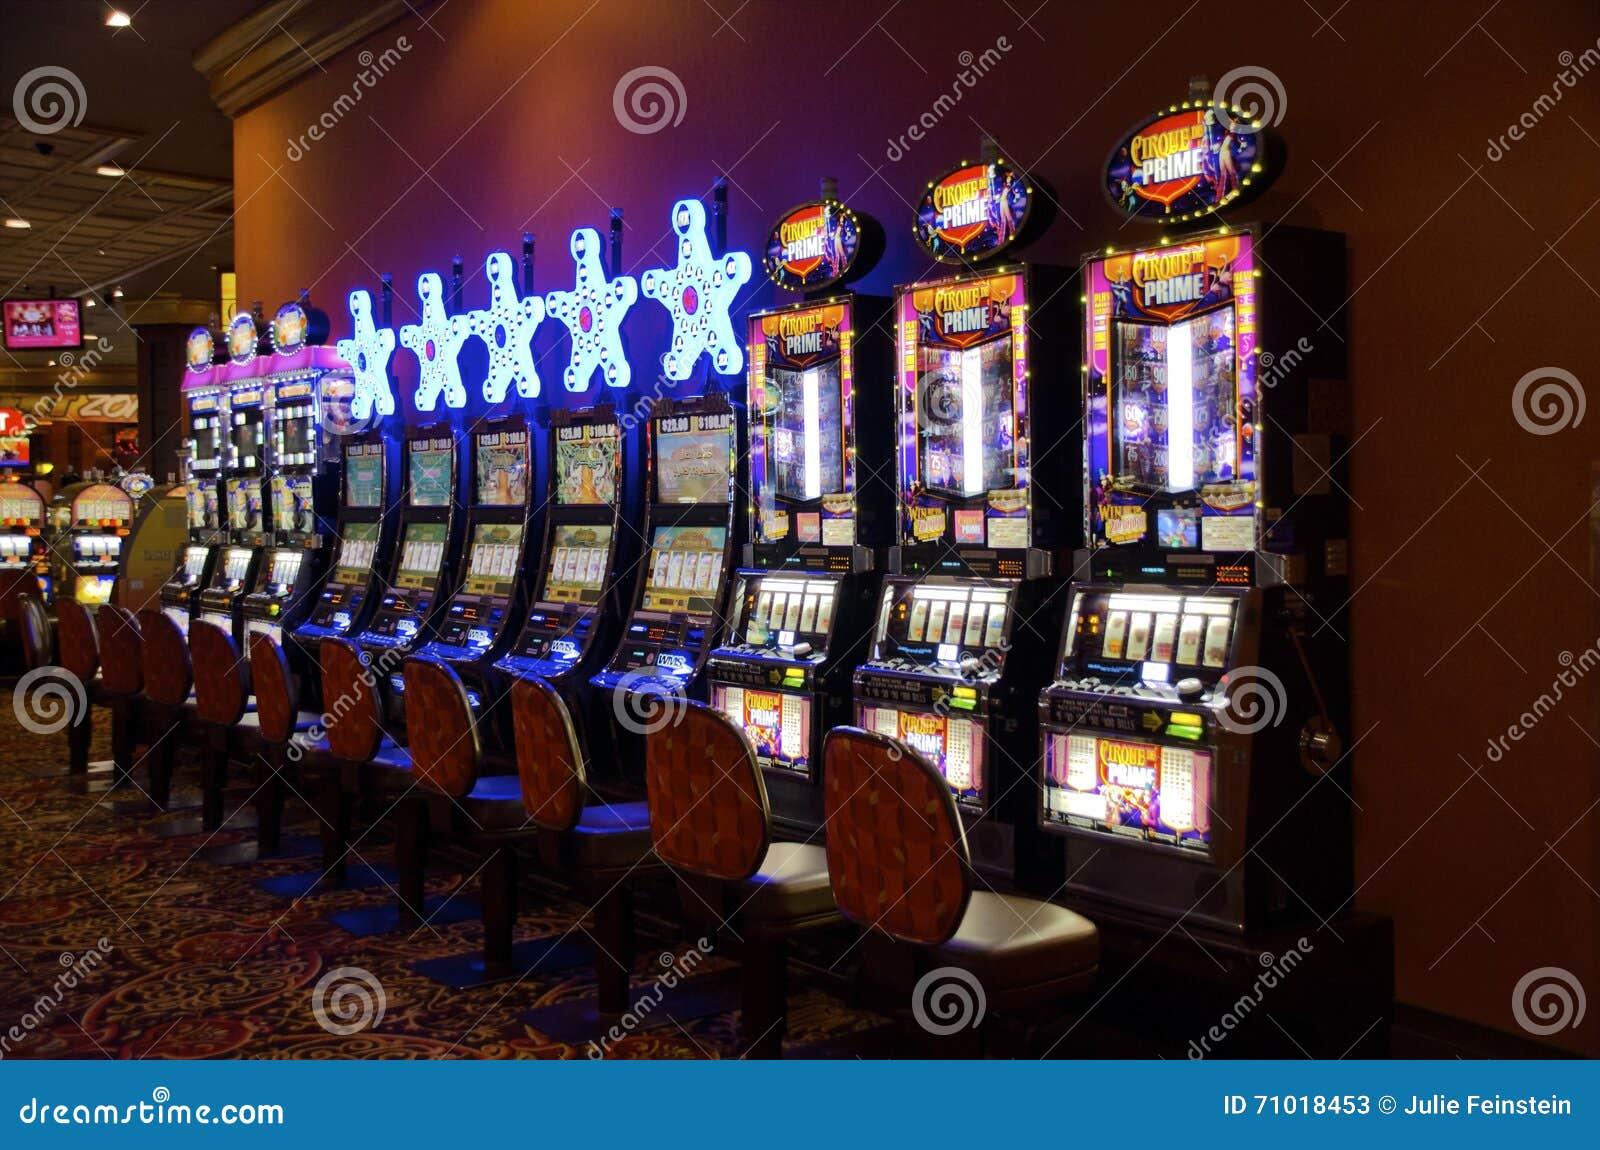 Trump atlantic city slot machines editorial stock photo for List of slot machines at motor city casino